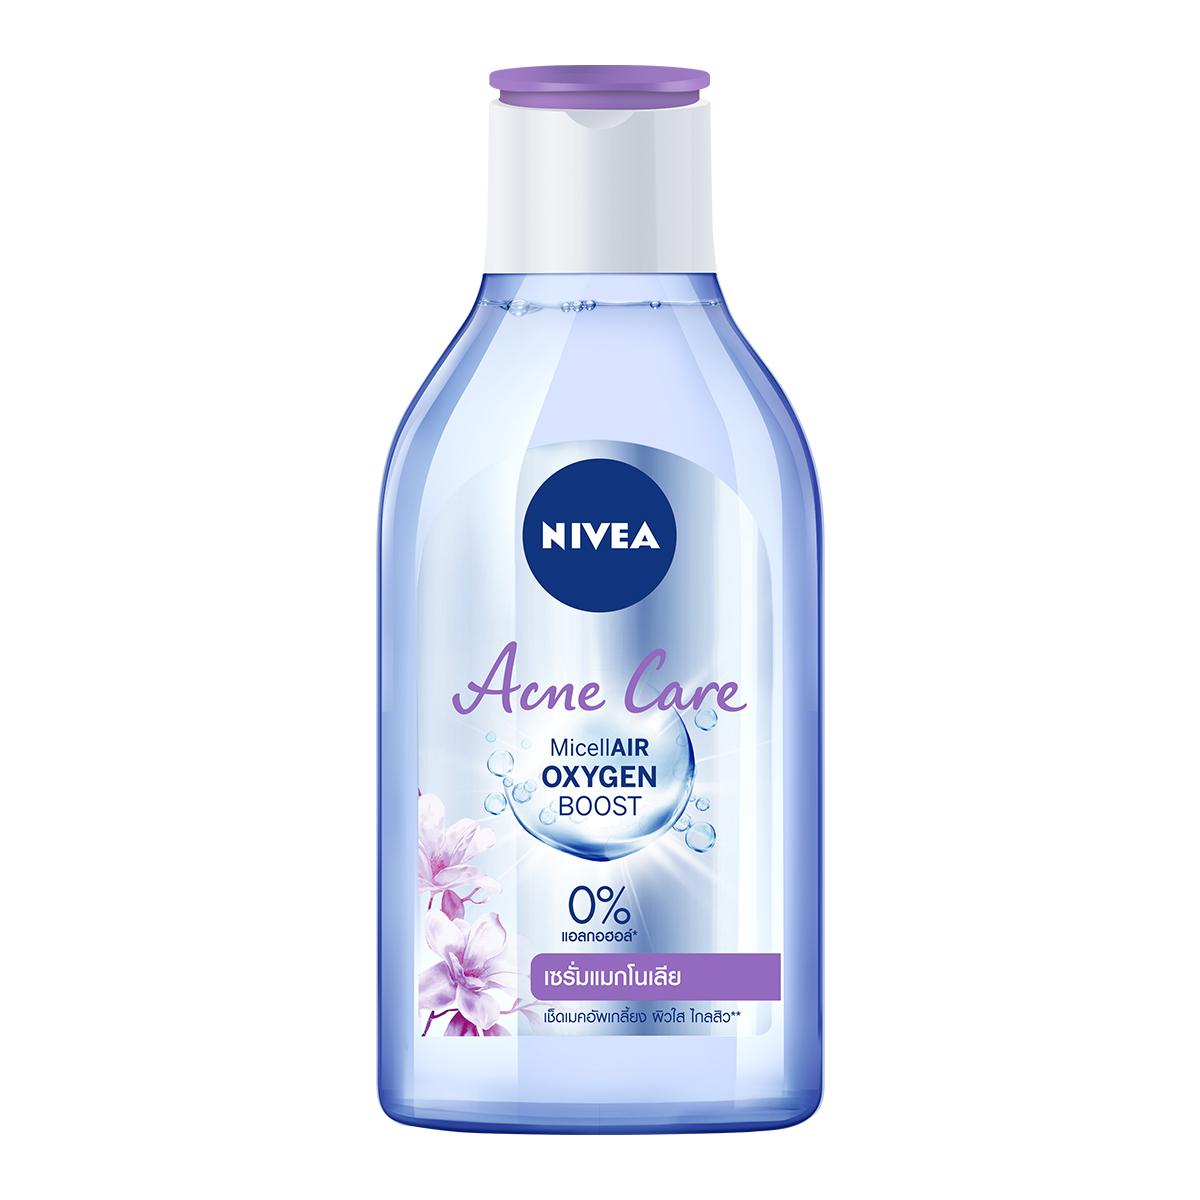 Nước tẩy trang NIVEA Acne Care Micellar Water chai 400 ml